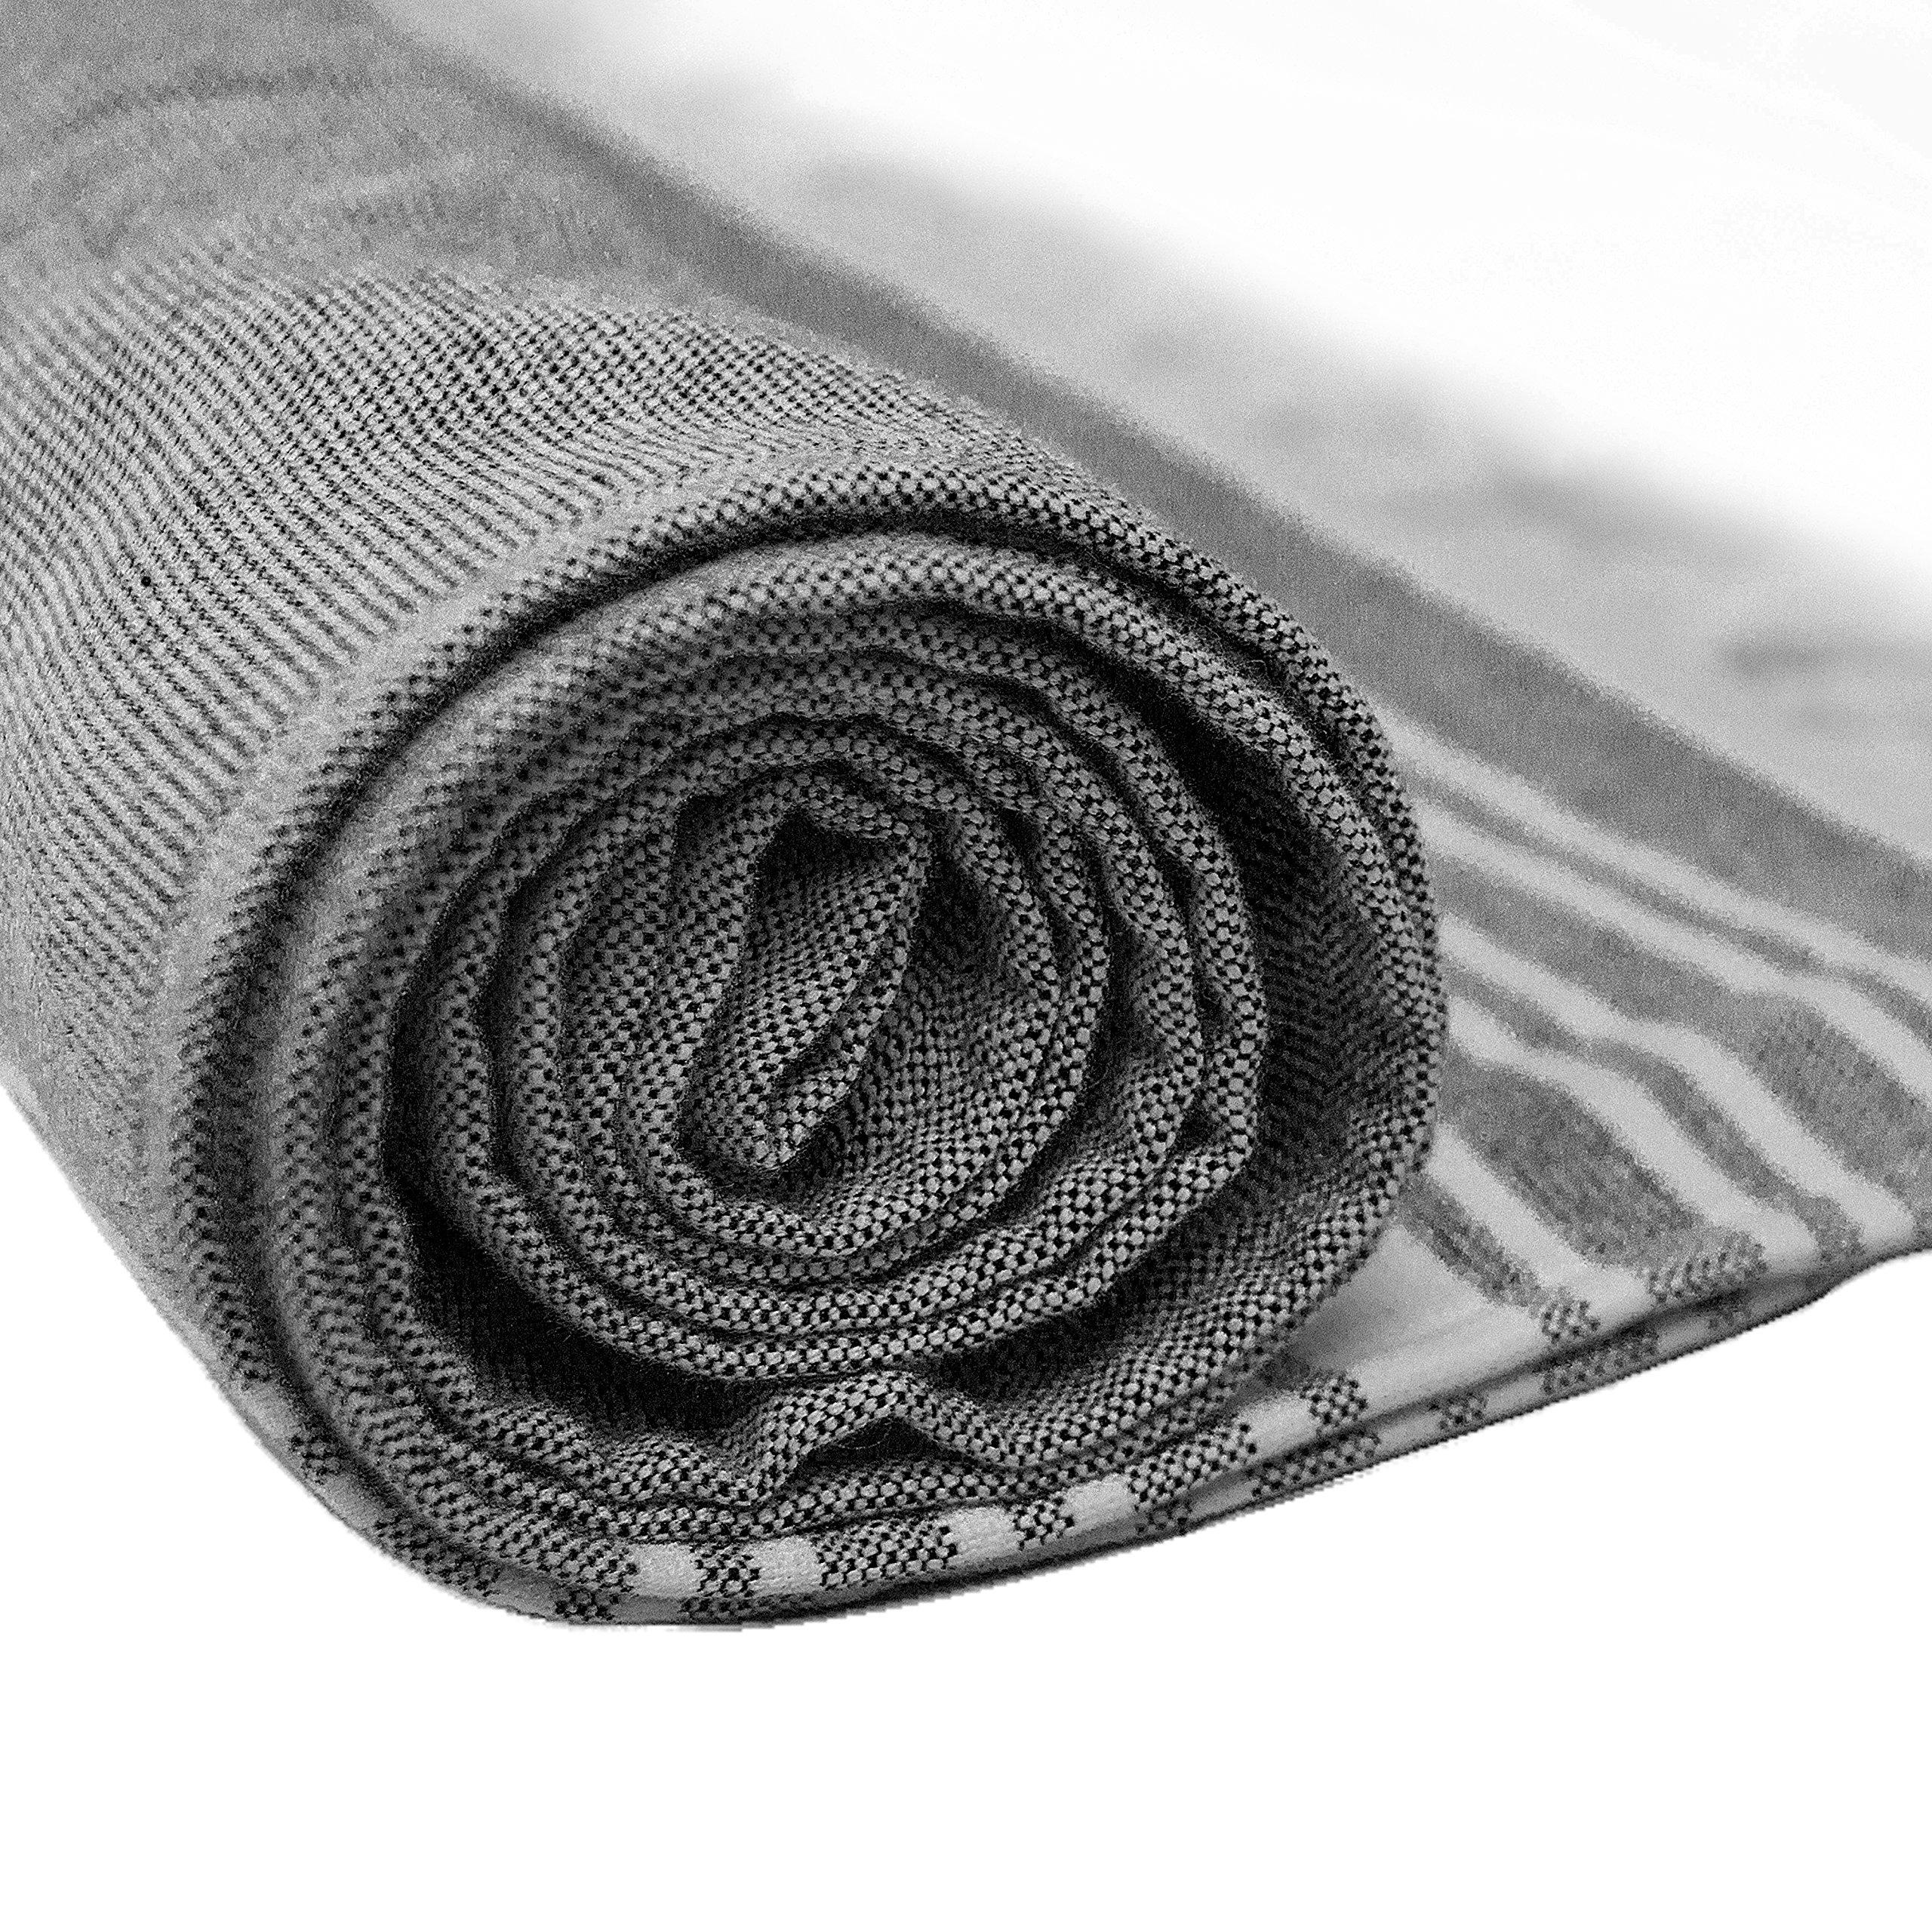 Prime Amazon Day - Caravalli Turkish Peshtemal Bath Sheet, York Charcoal Grey OverSized Cotton Flat Towel for Bathroom, Turkish Large Woven Cotton Beach Towel, 35 x 70 XL Luxury Gray Peshtamal Towel